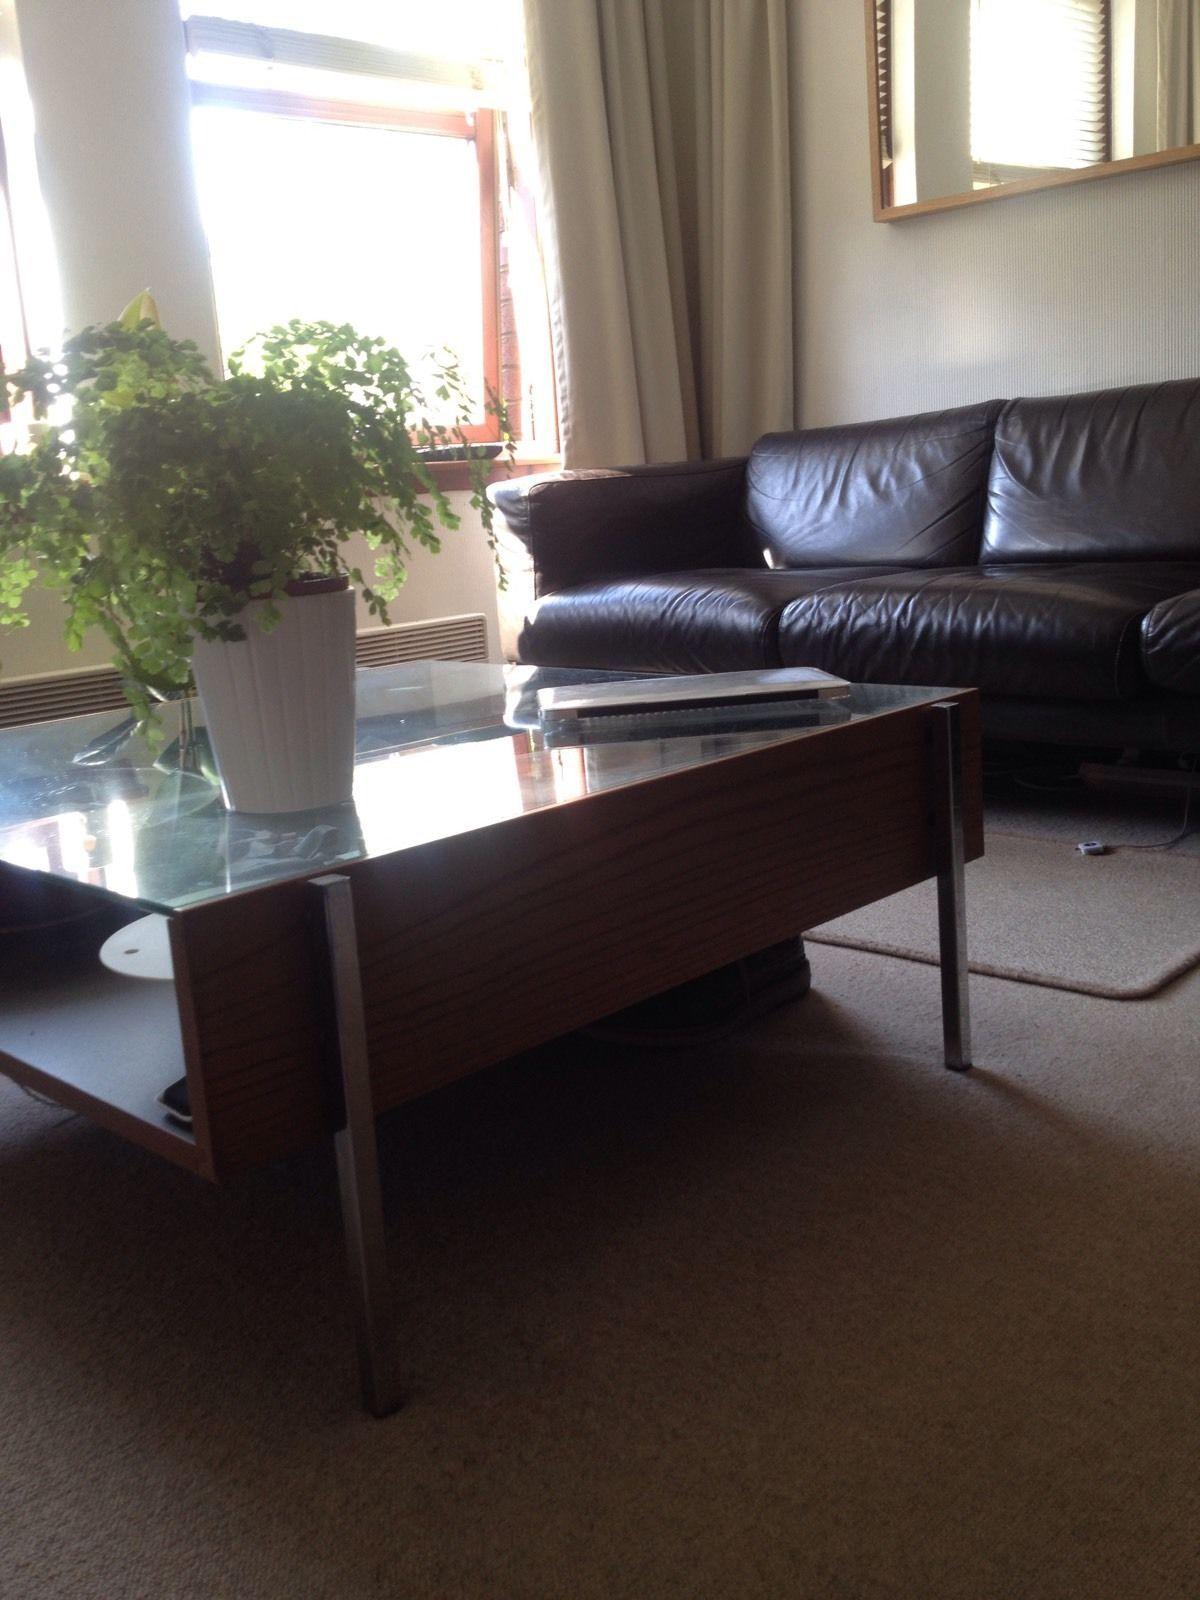 robin day forumhabitat . 3 seater sofa arm chair and coffee